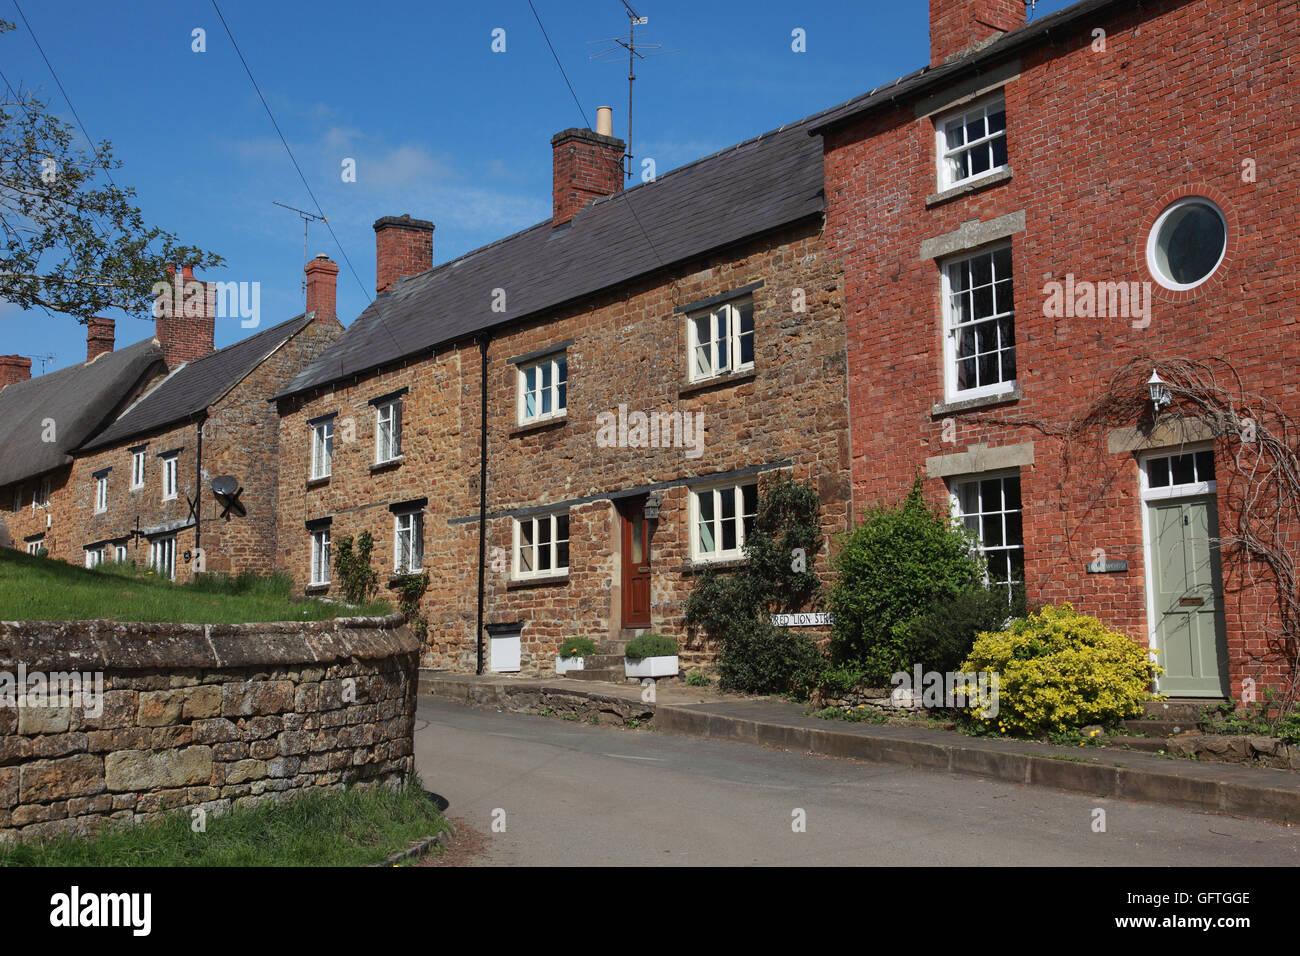 Red Lion street Cropredy, Oxfordshire - Stock Image